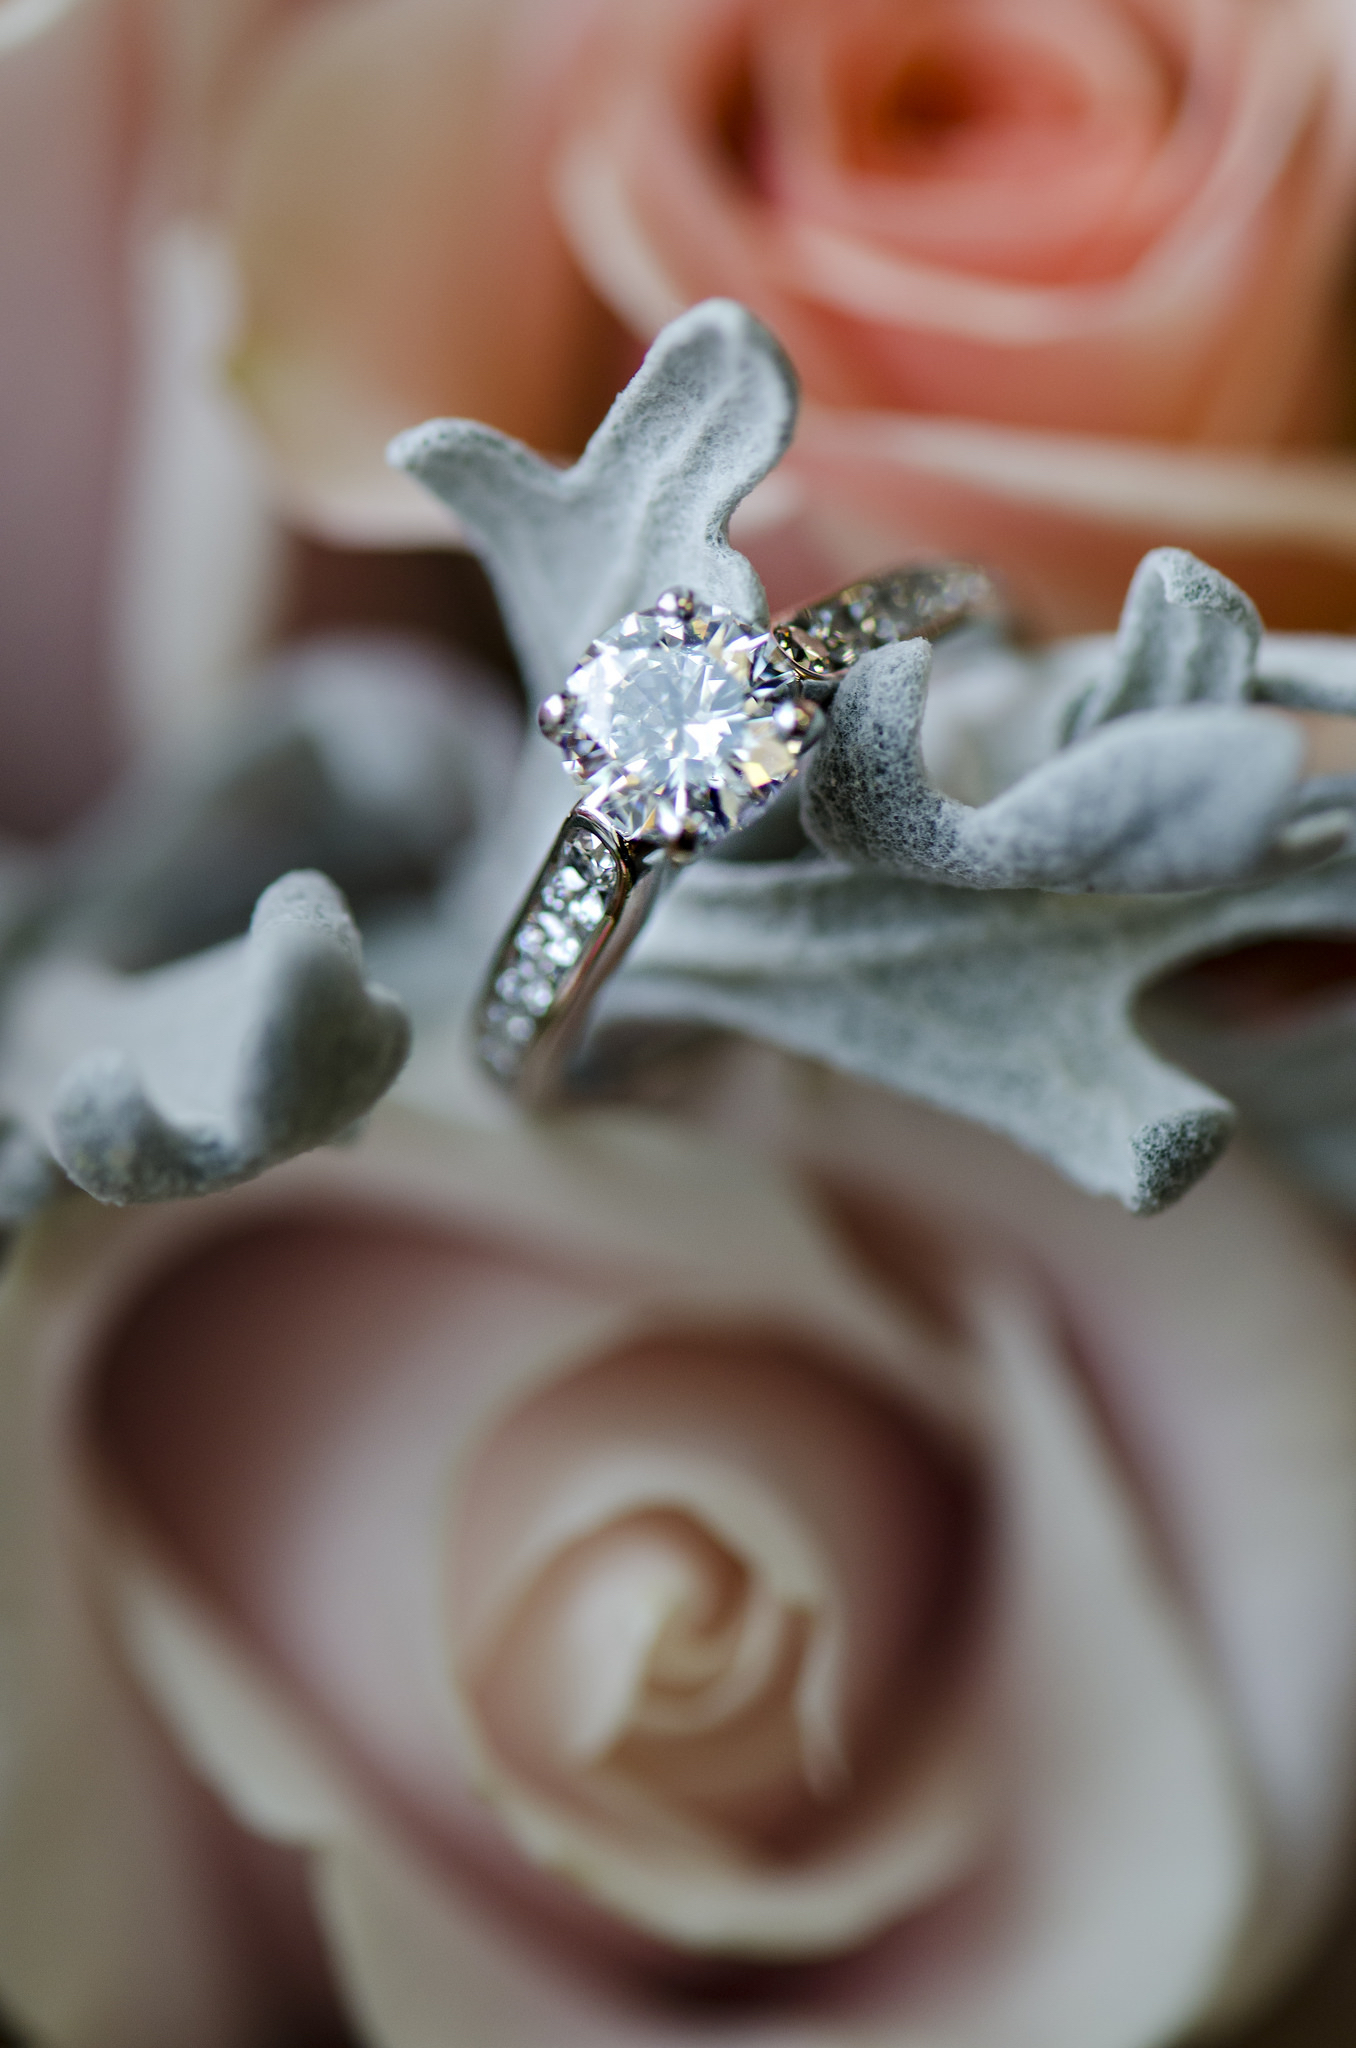 kristine_wedding_rings_spiritedtable_photo16.jpg